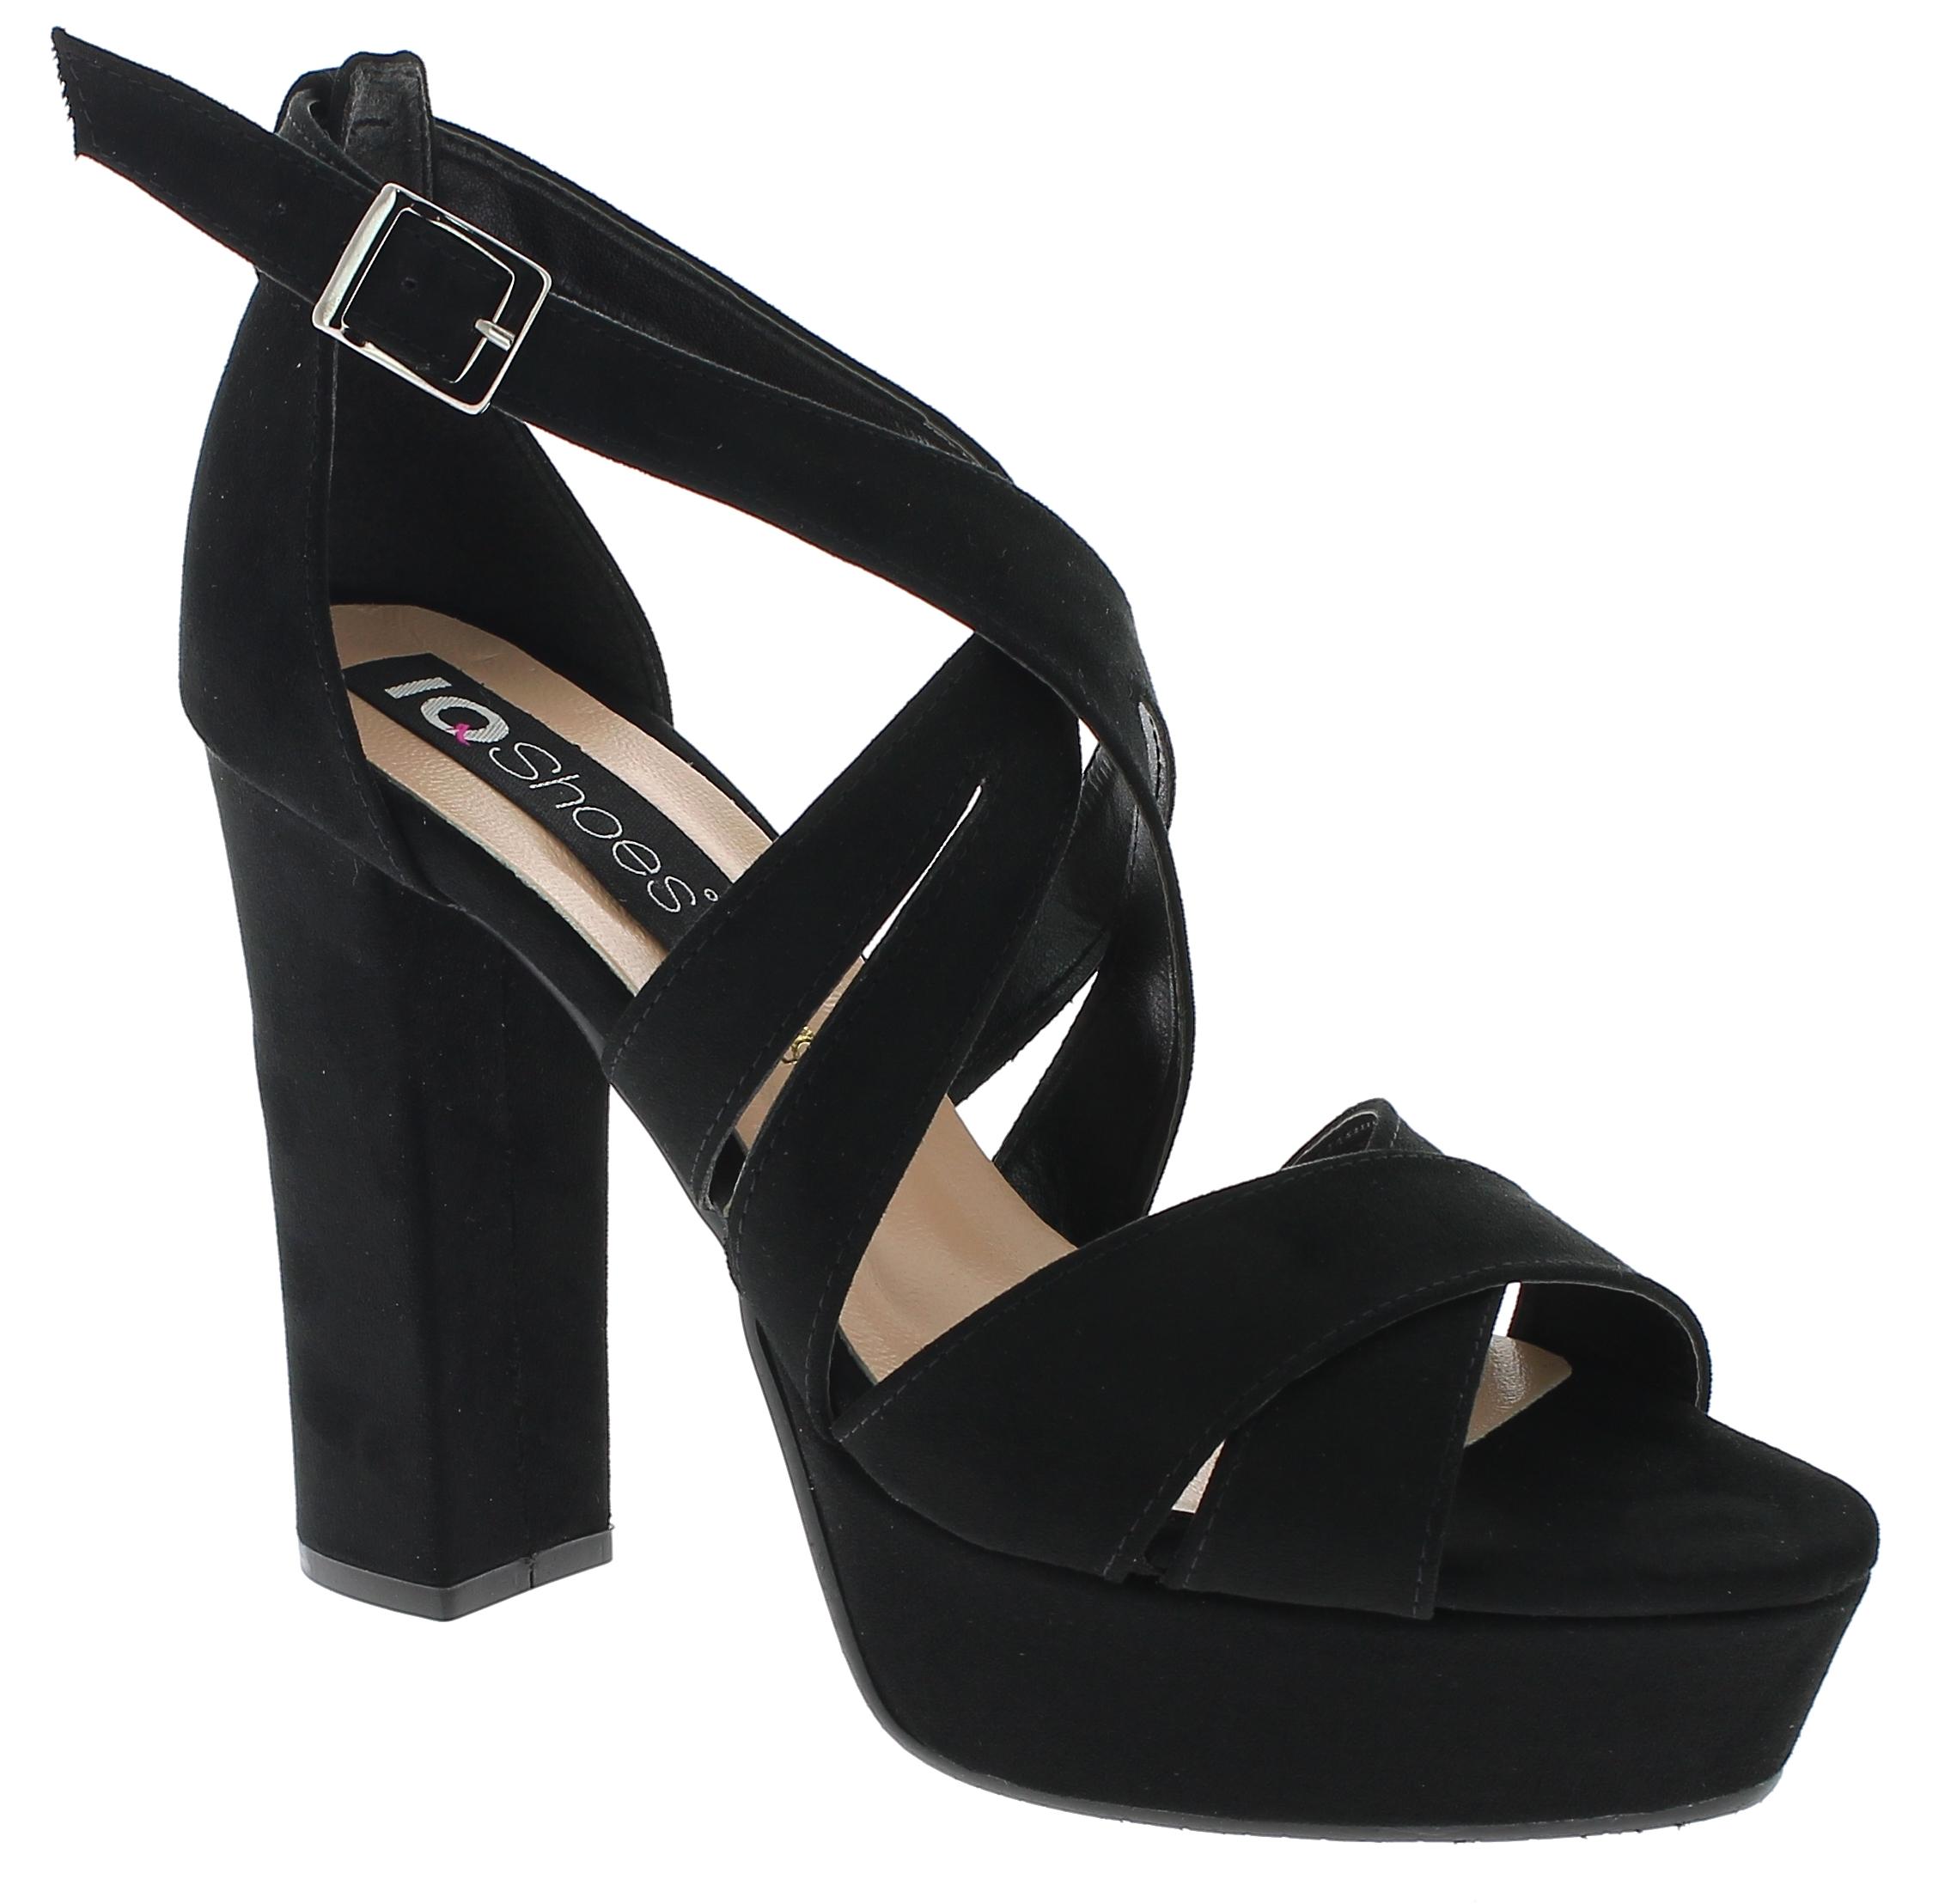 IQSHOES Γυναικείο Πέδιλο 1850 Μαύρο - IqShoes - 41.1850 BLACK -black-36/1/15/7 παπούτσια  πέδιλα